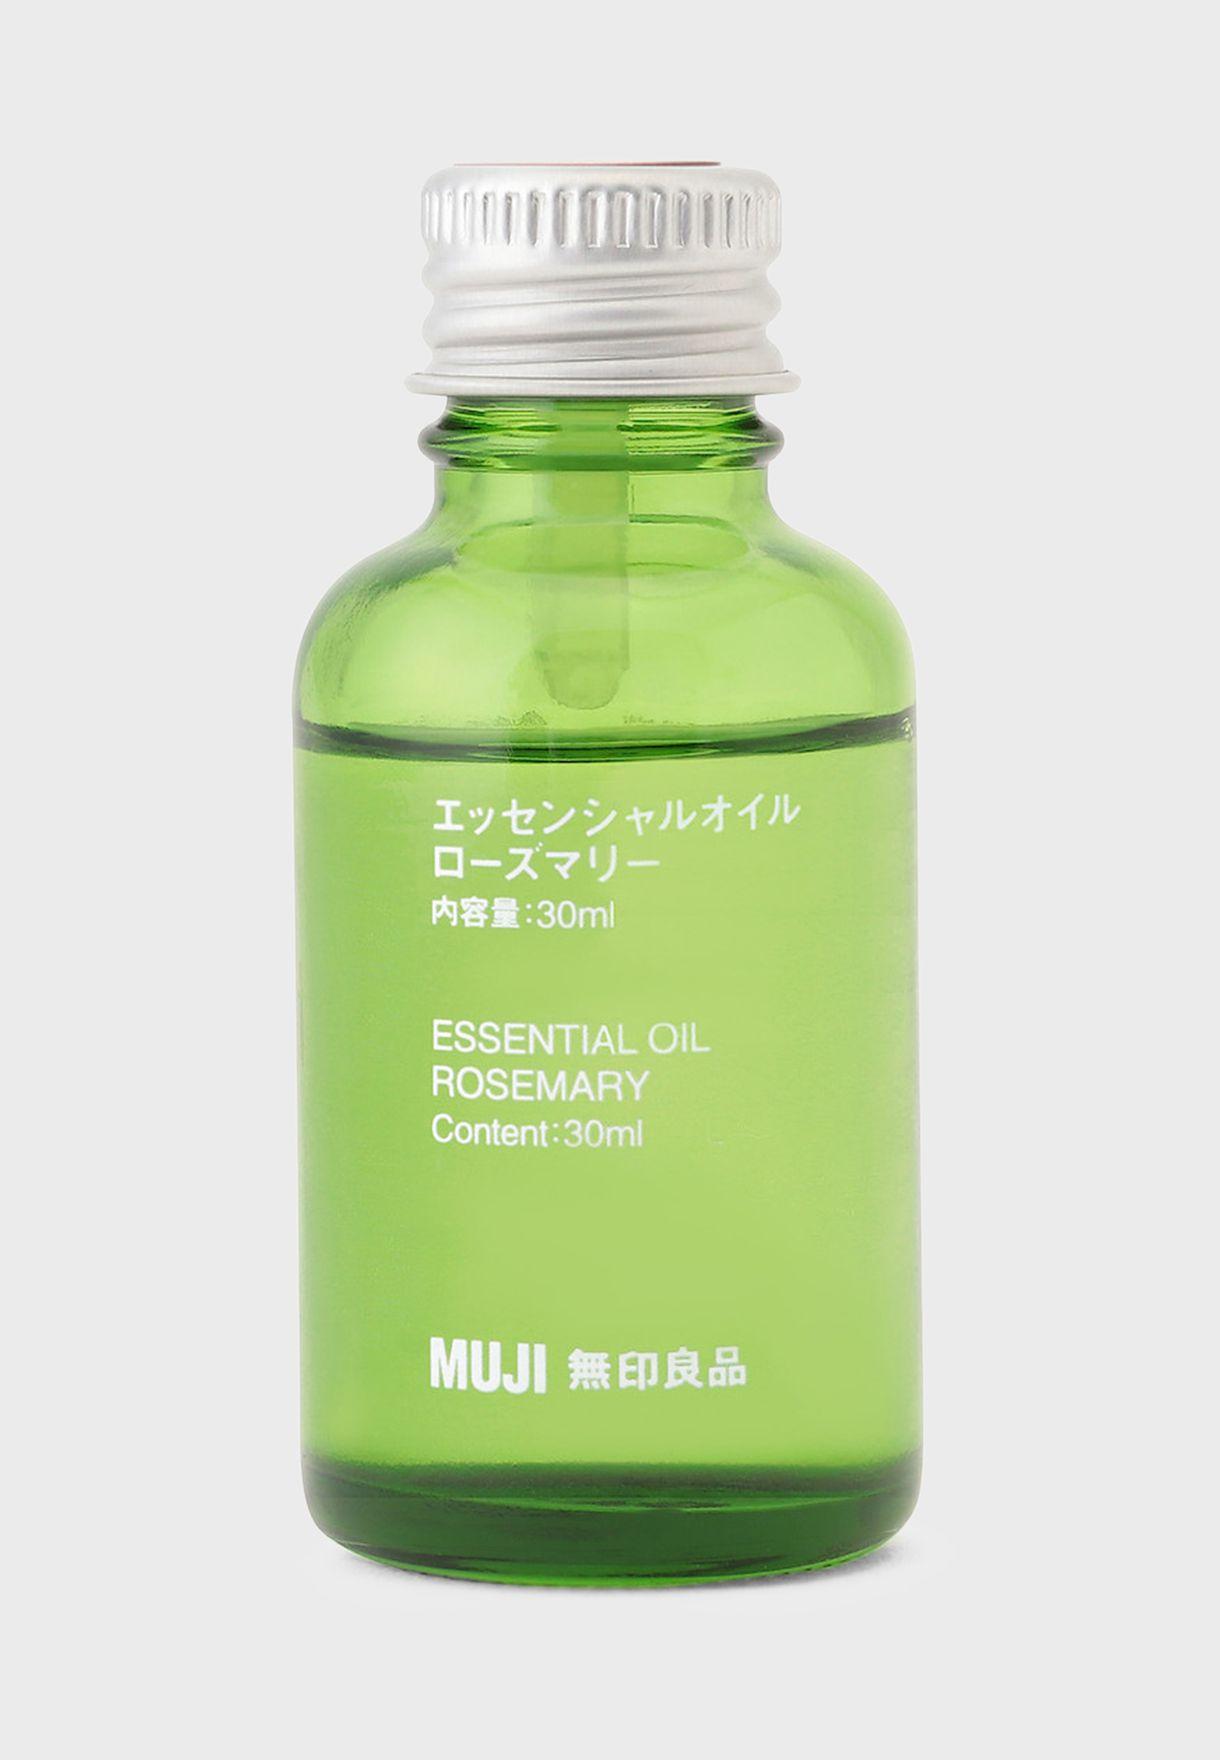 Essential Oil Rosemary 30Ml